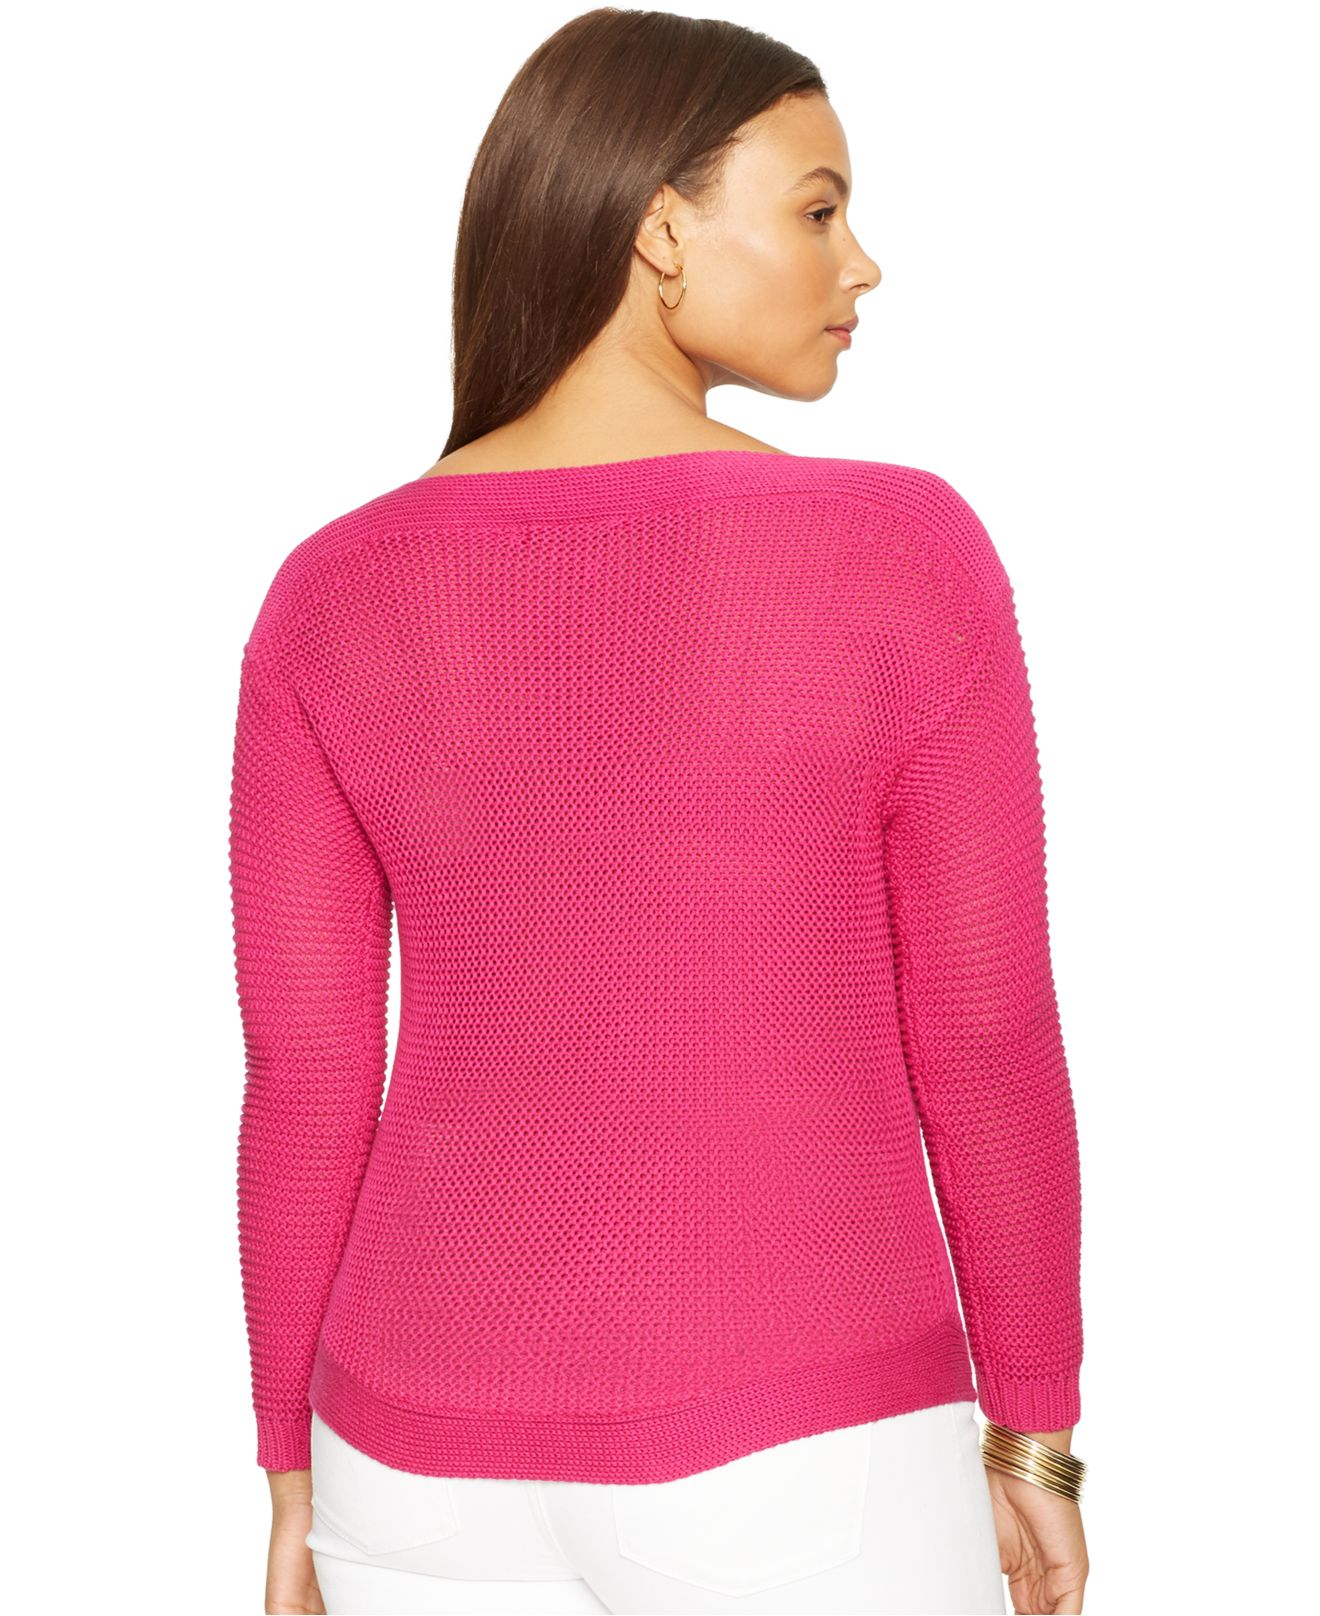 bb84f01bf64 ... new zealand lyst lauren by ralph lauren plus size boat neck sweater in  pink 4be68 5fafc